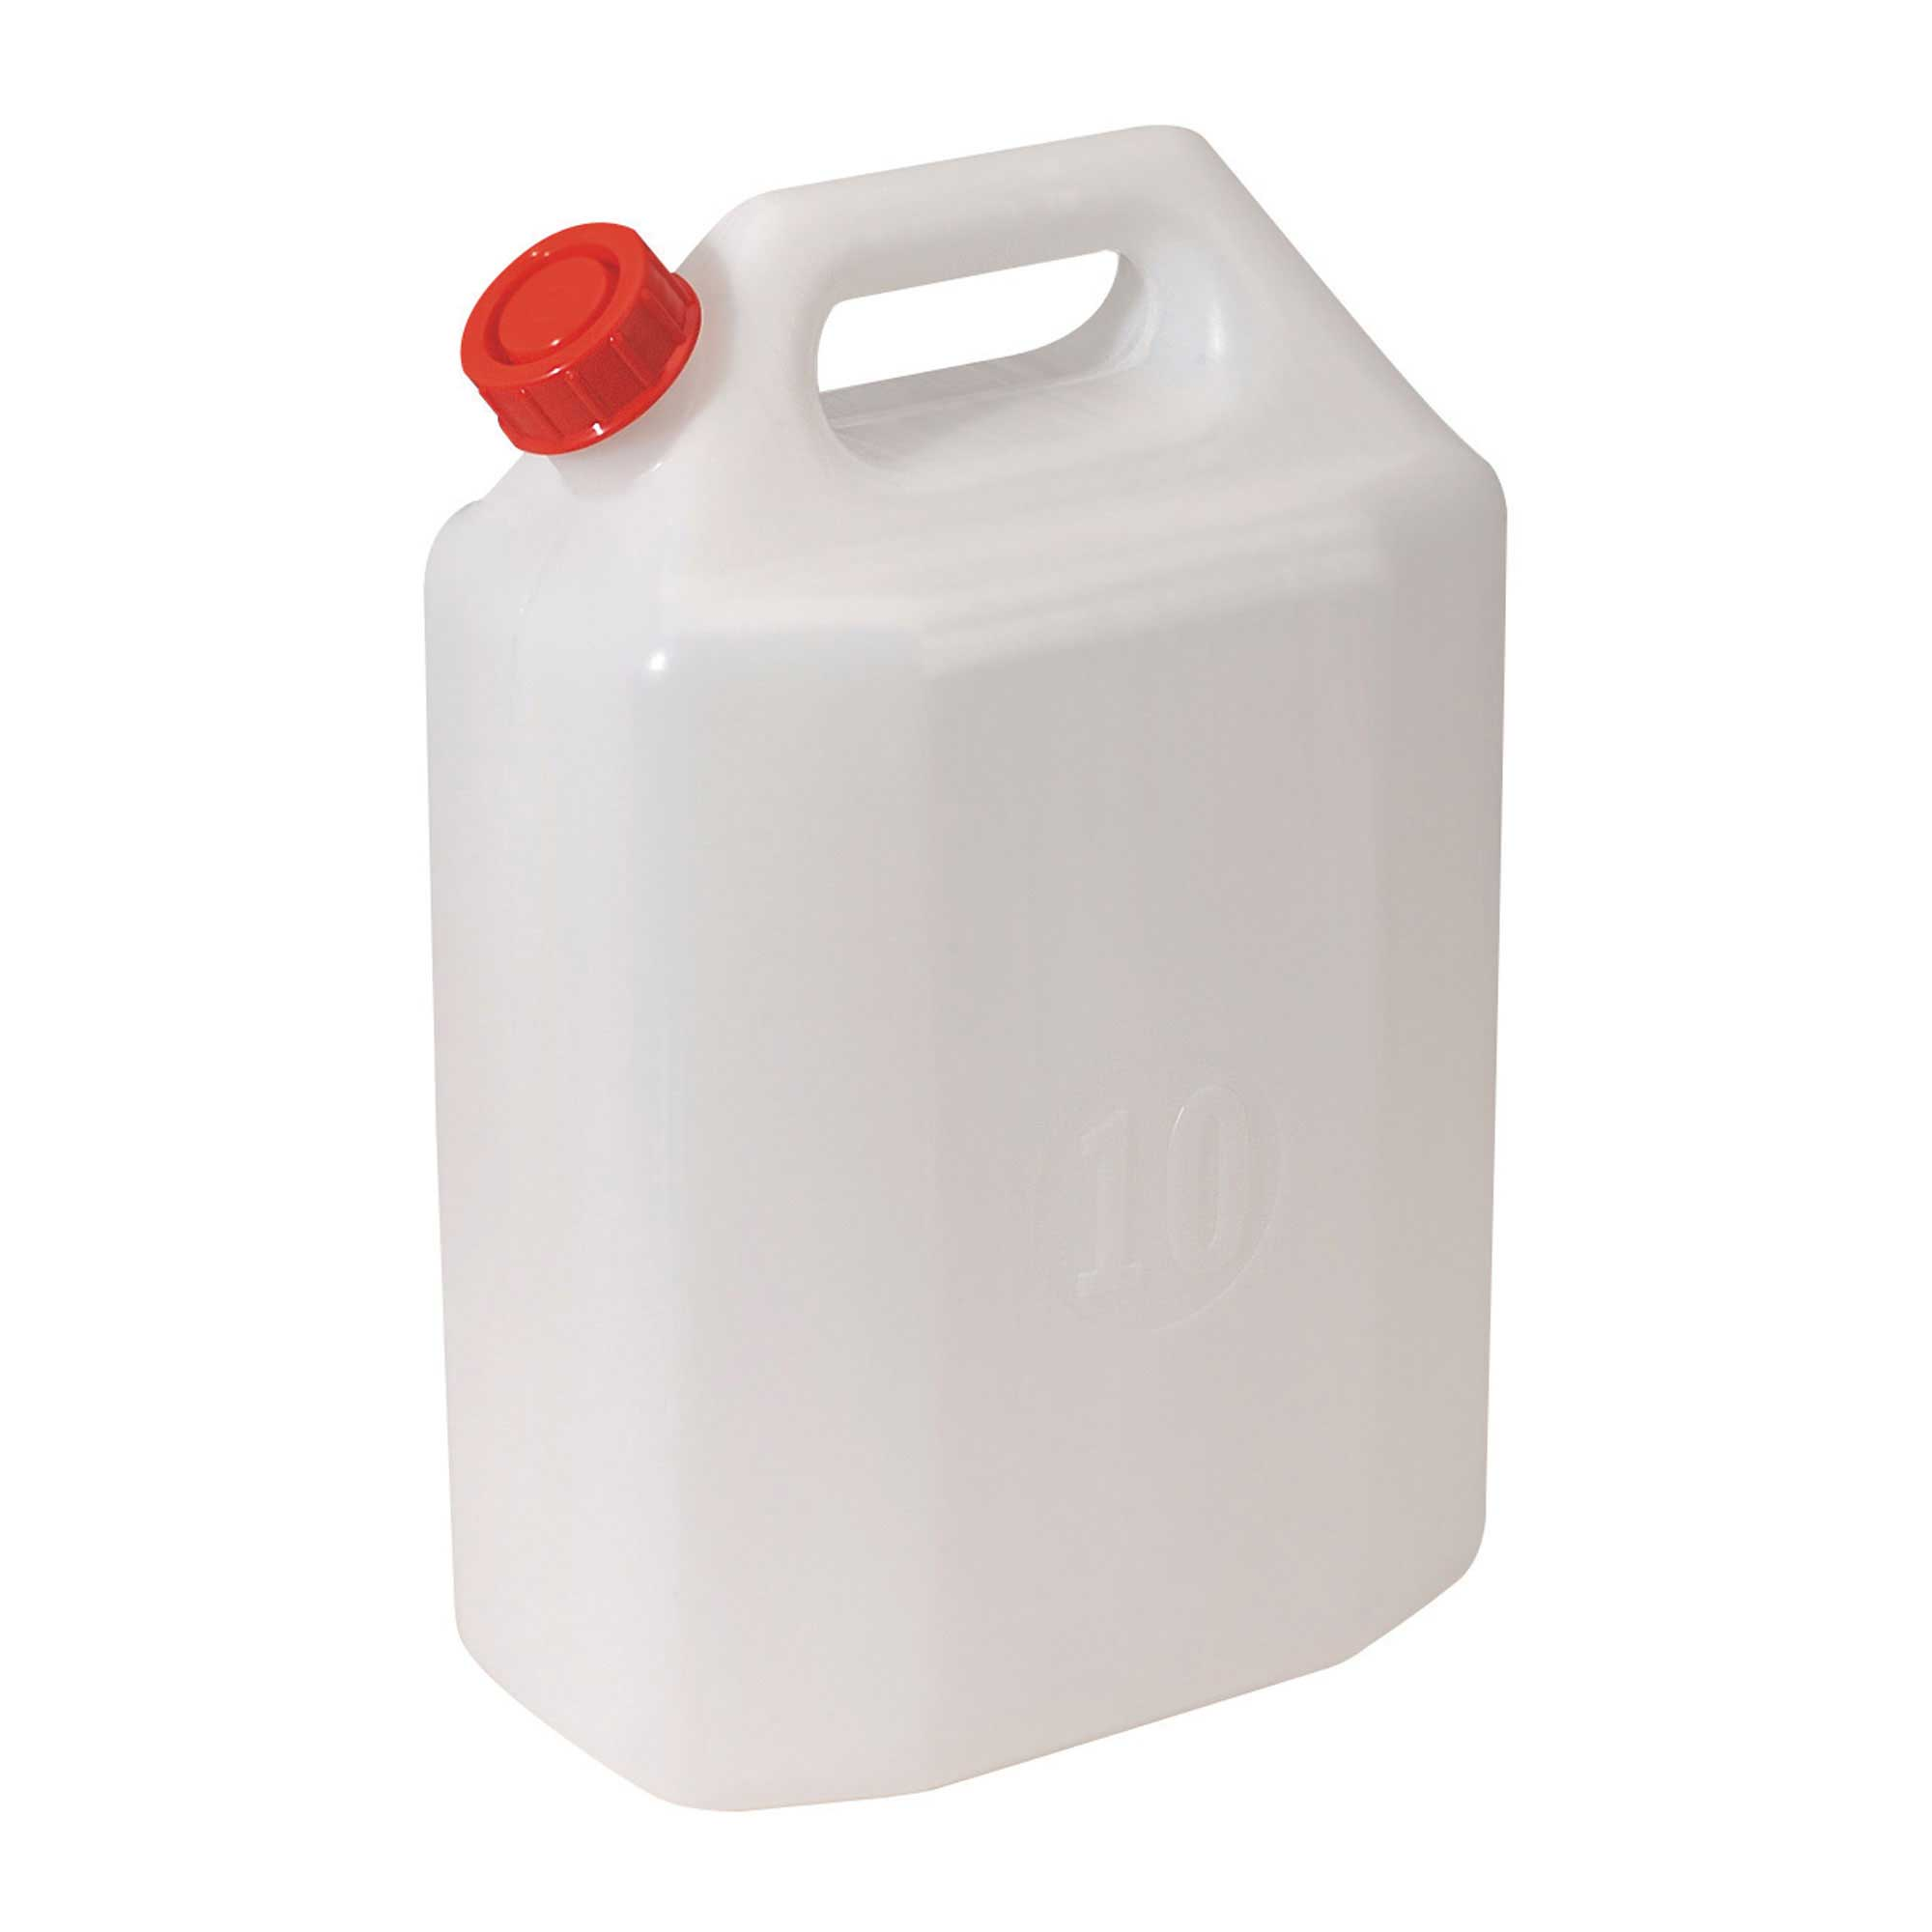 Sealey 10 Litre Plastic Water / Fluid Container, Garage / Workshop / Garden  5024209684637 | eBay